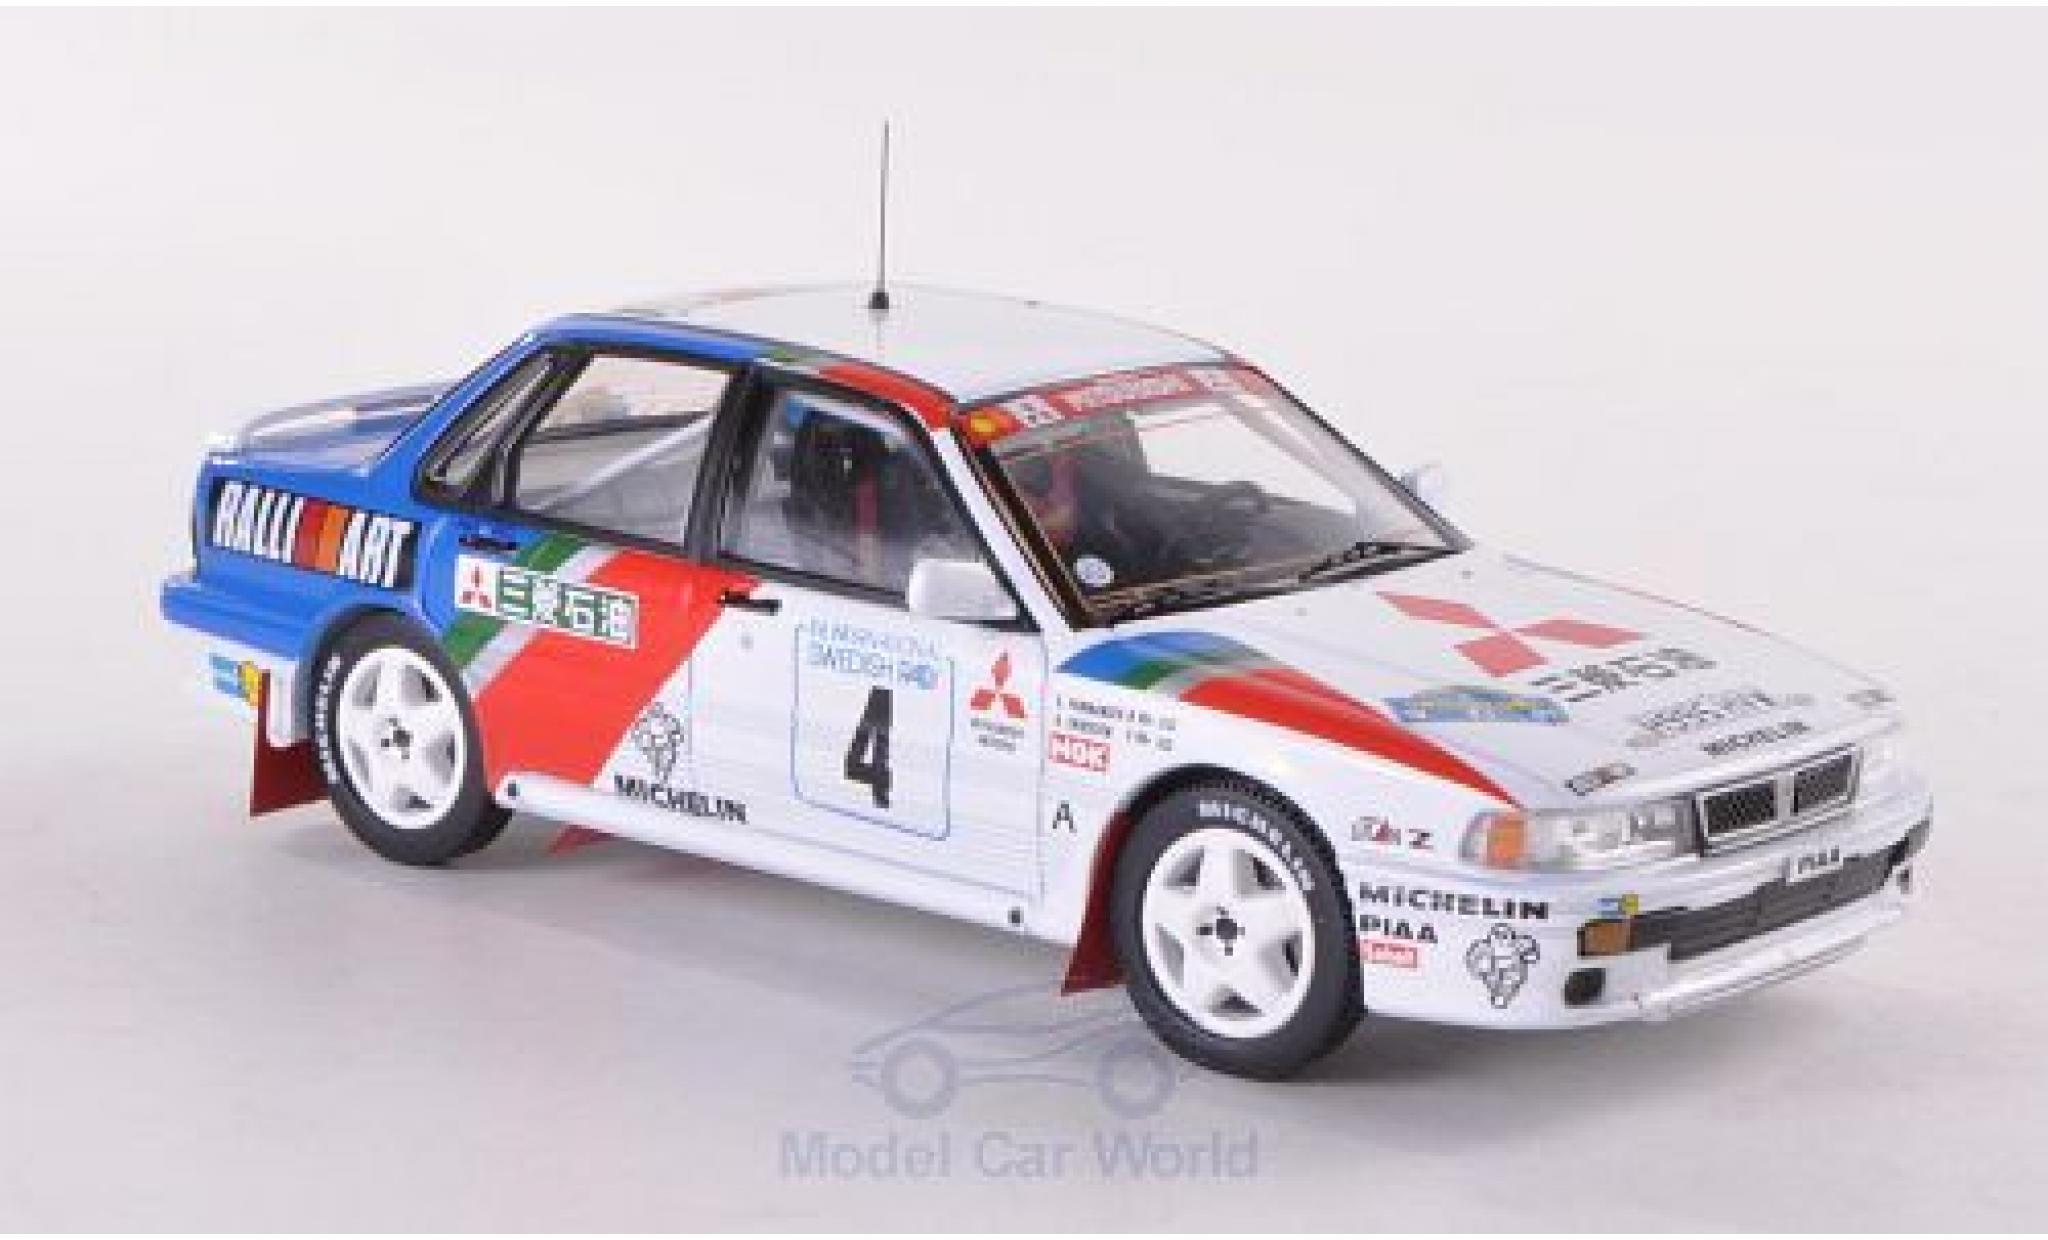 Mitsubishi Galant 1/43 IXO VR-4 No.4 Ralliart Rallye WM Rallye Schweden 1991